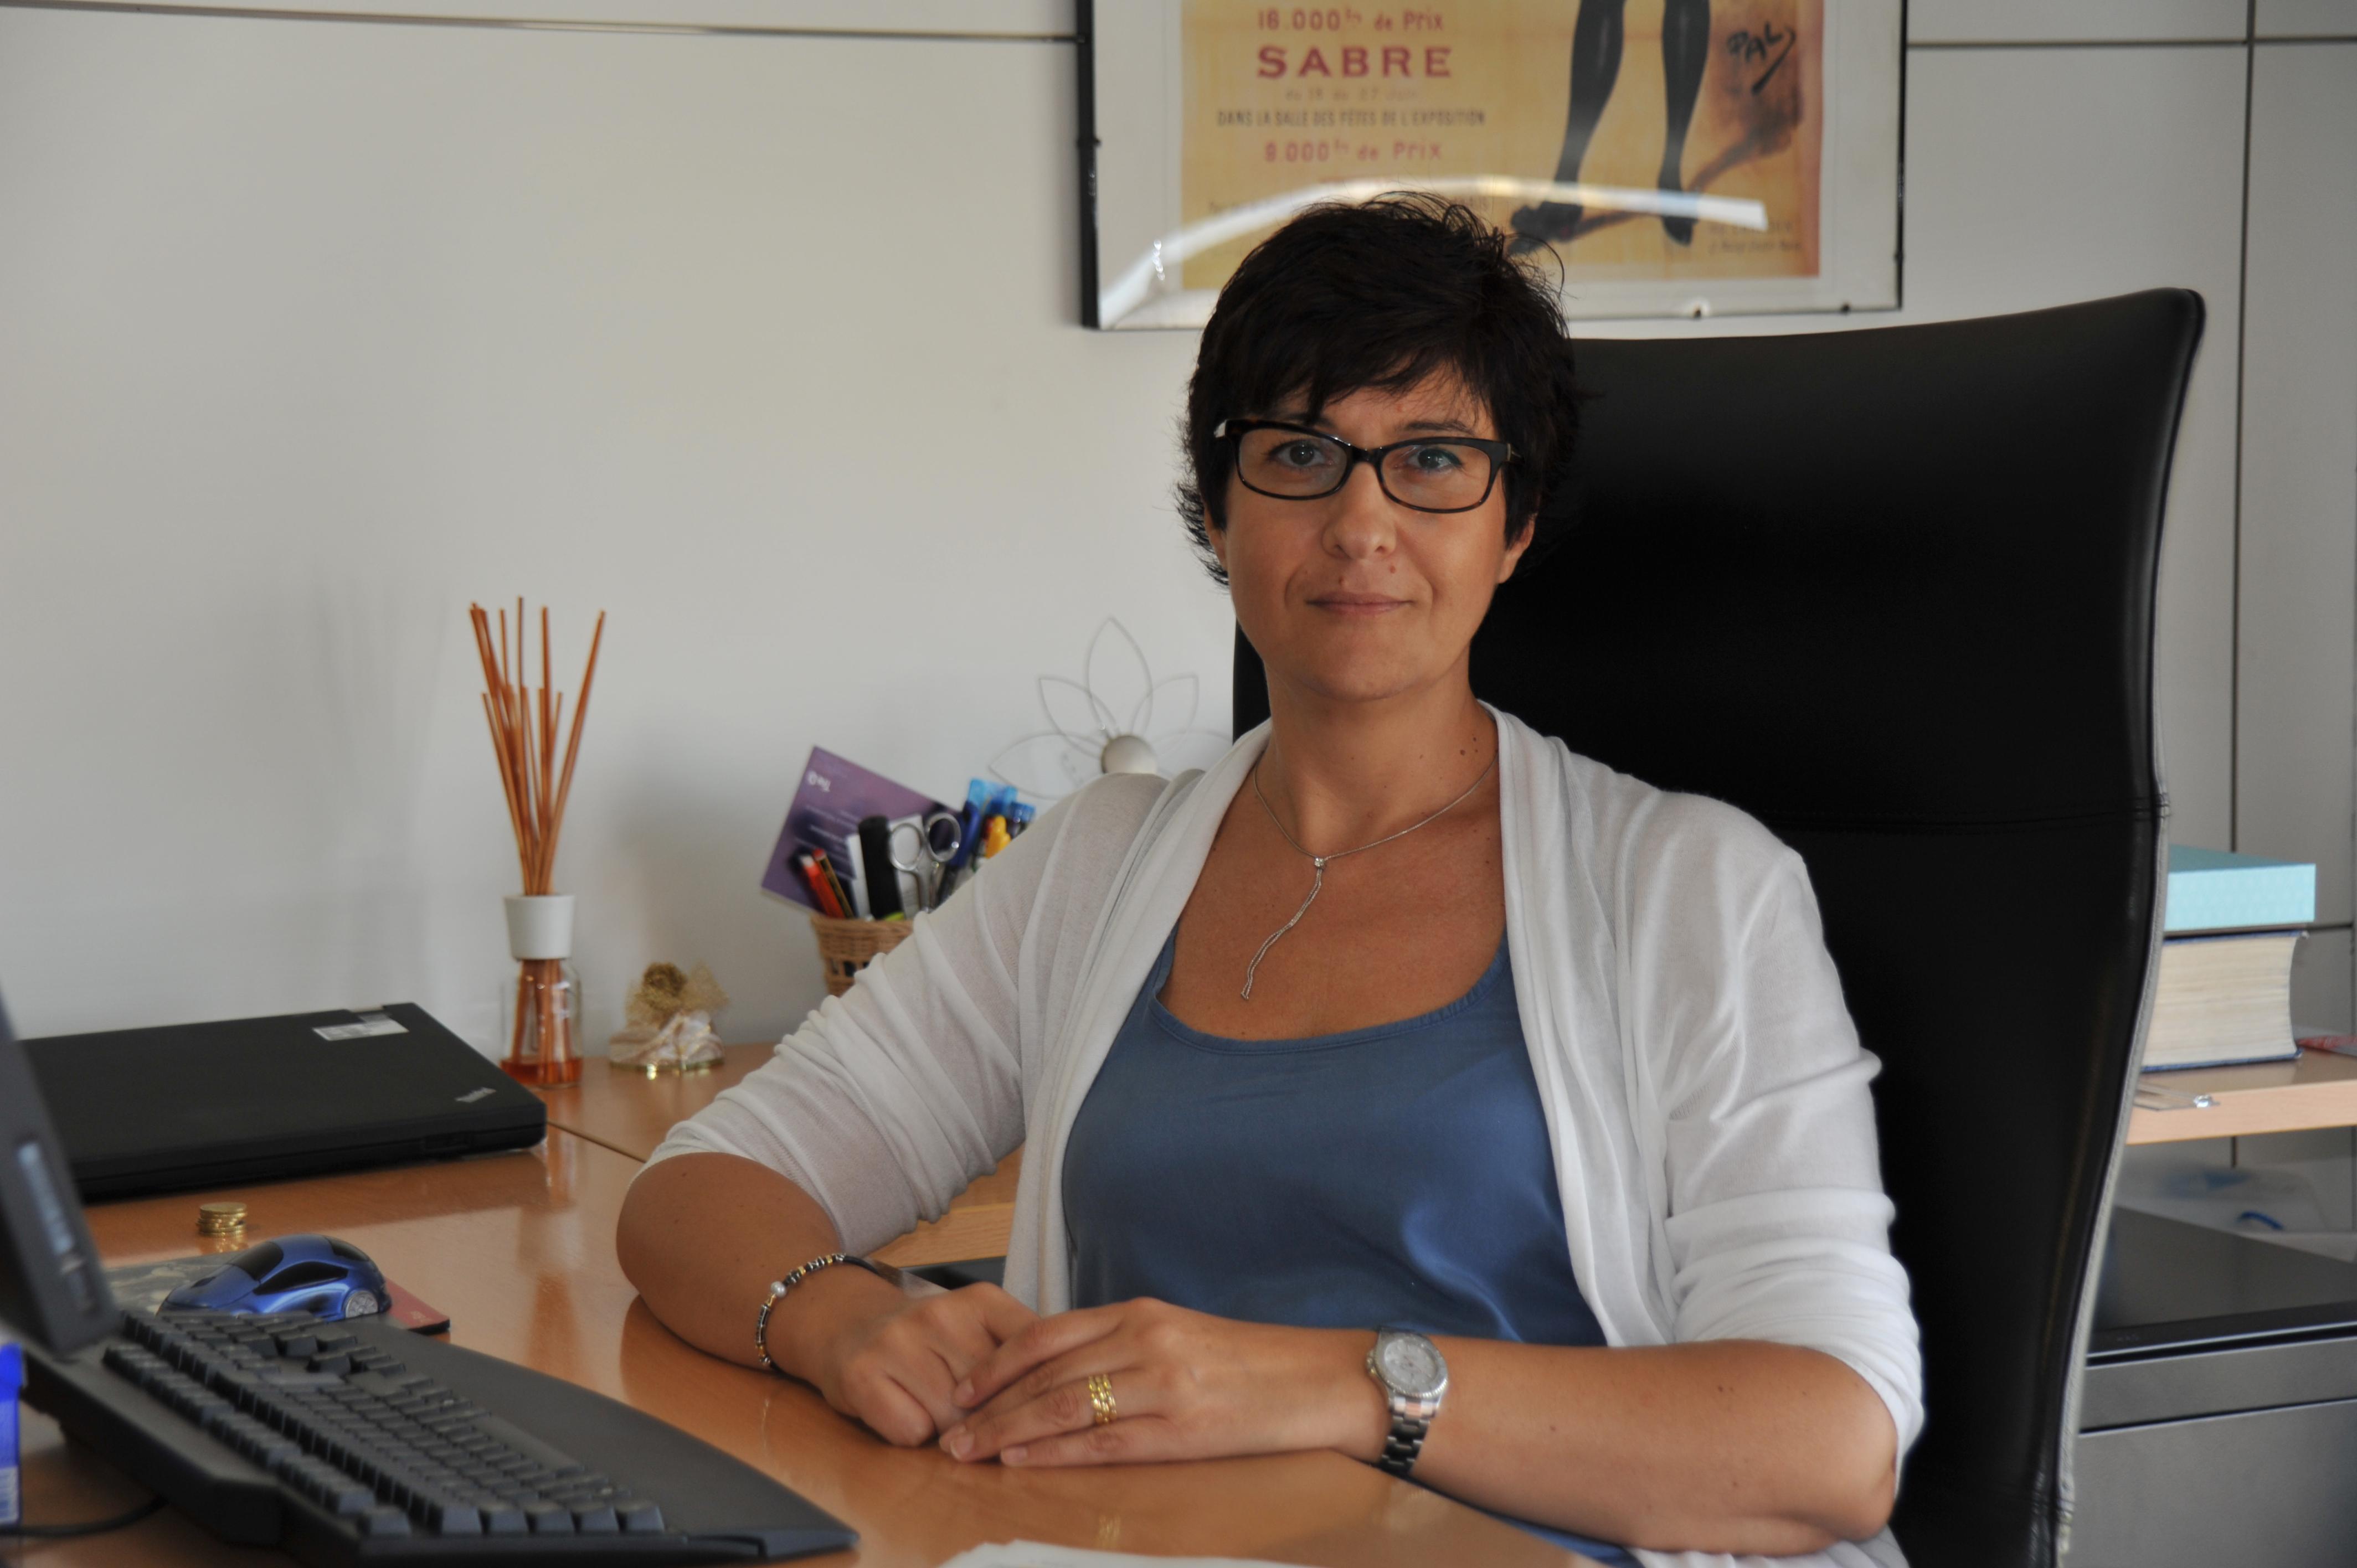 Laura_Venturini_workplace